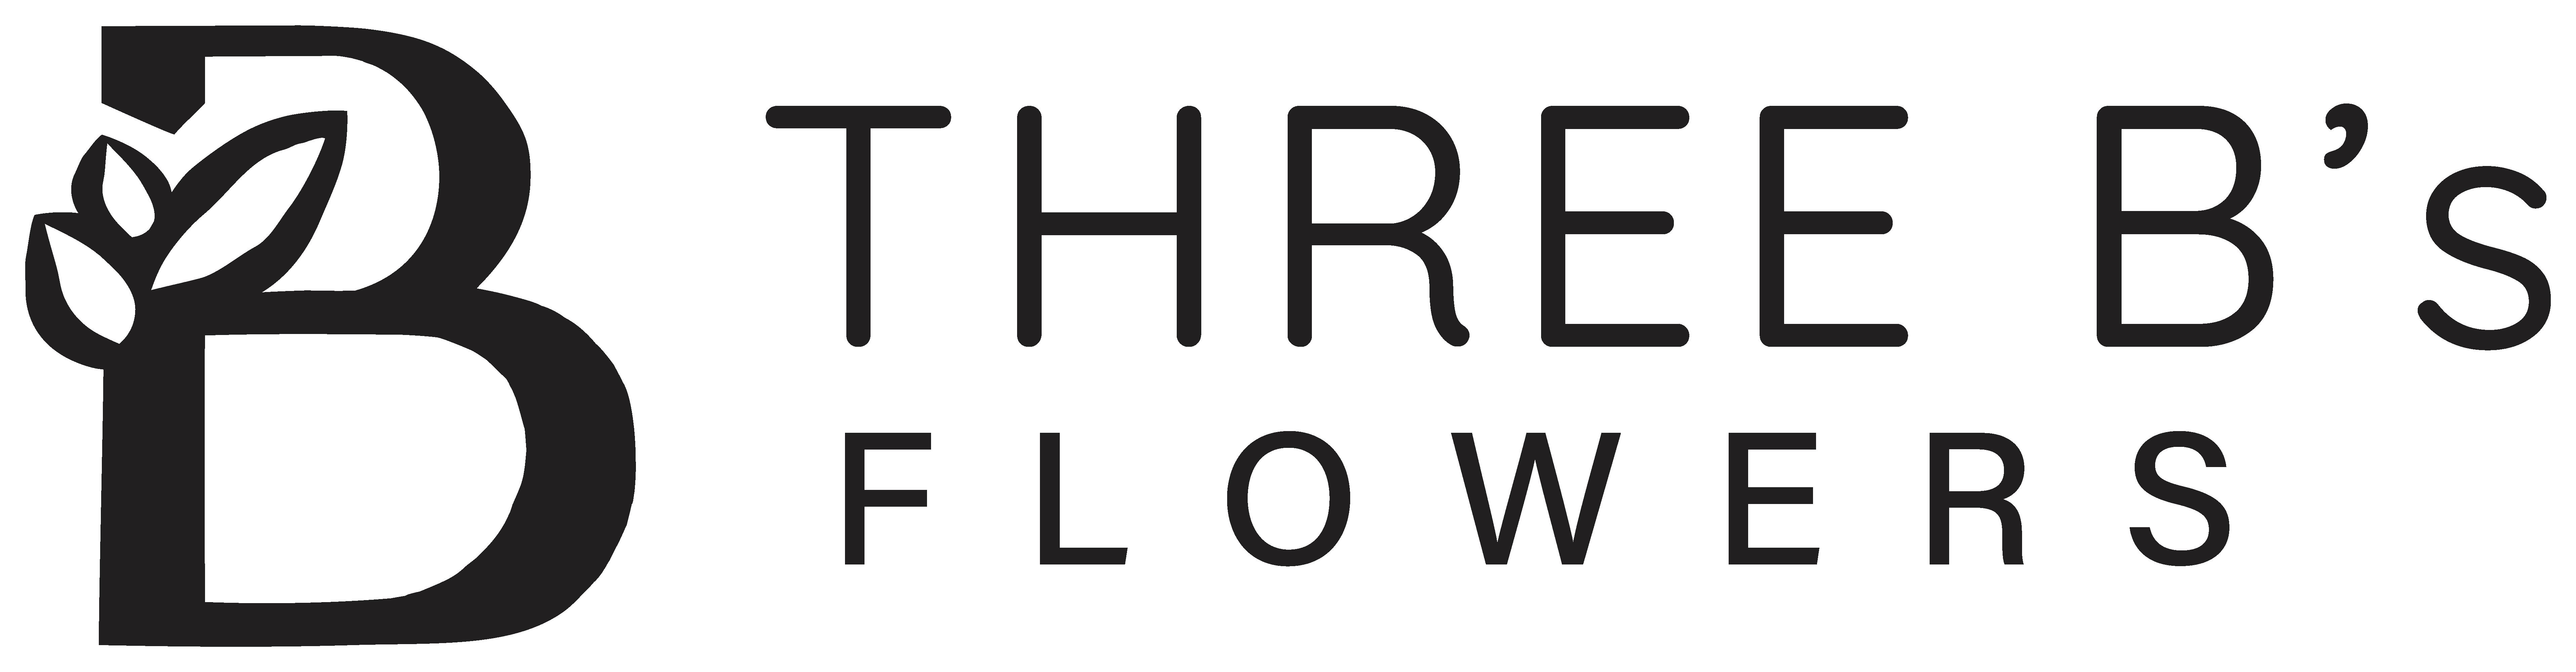 3Bs Flowers_logo 2021 Horizontal